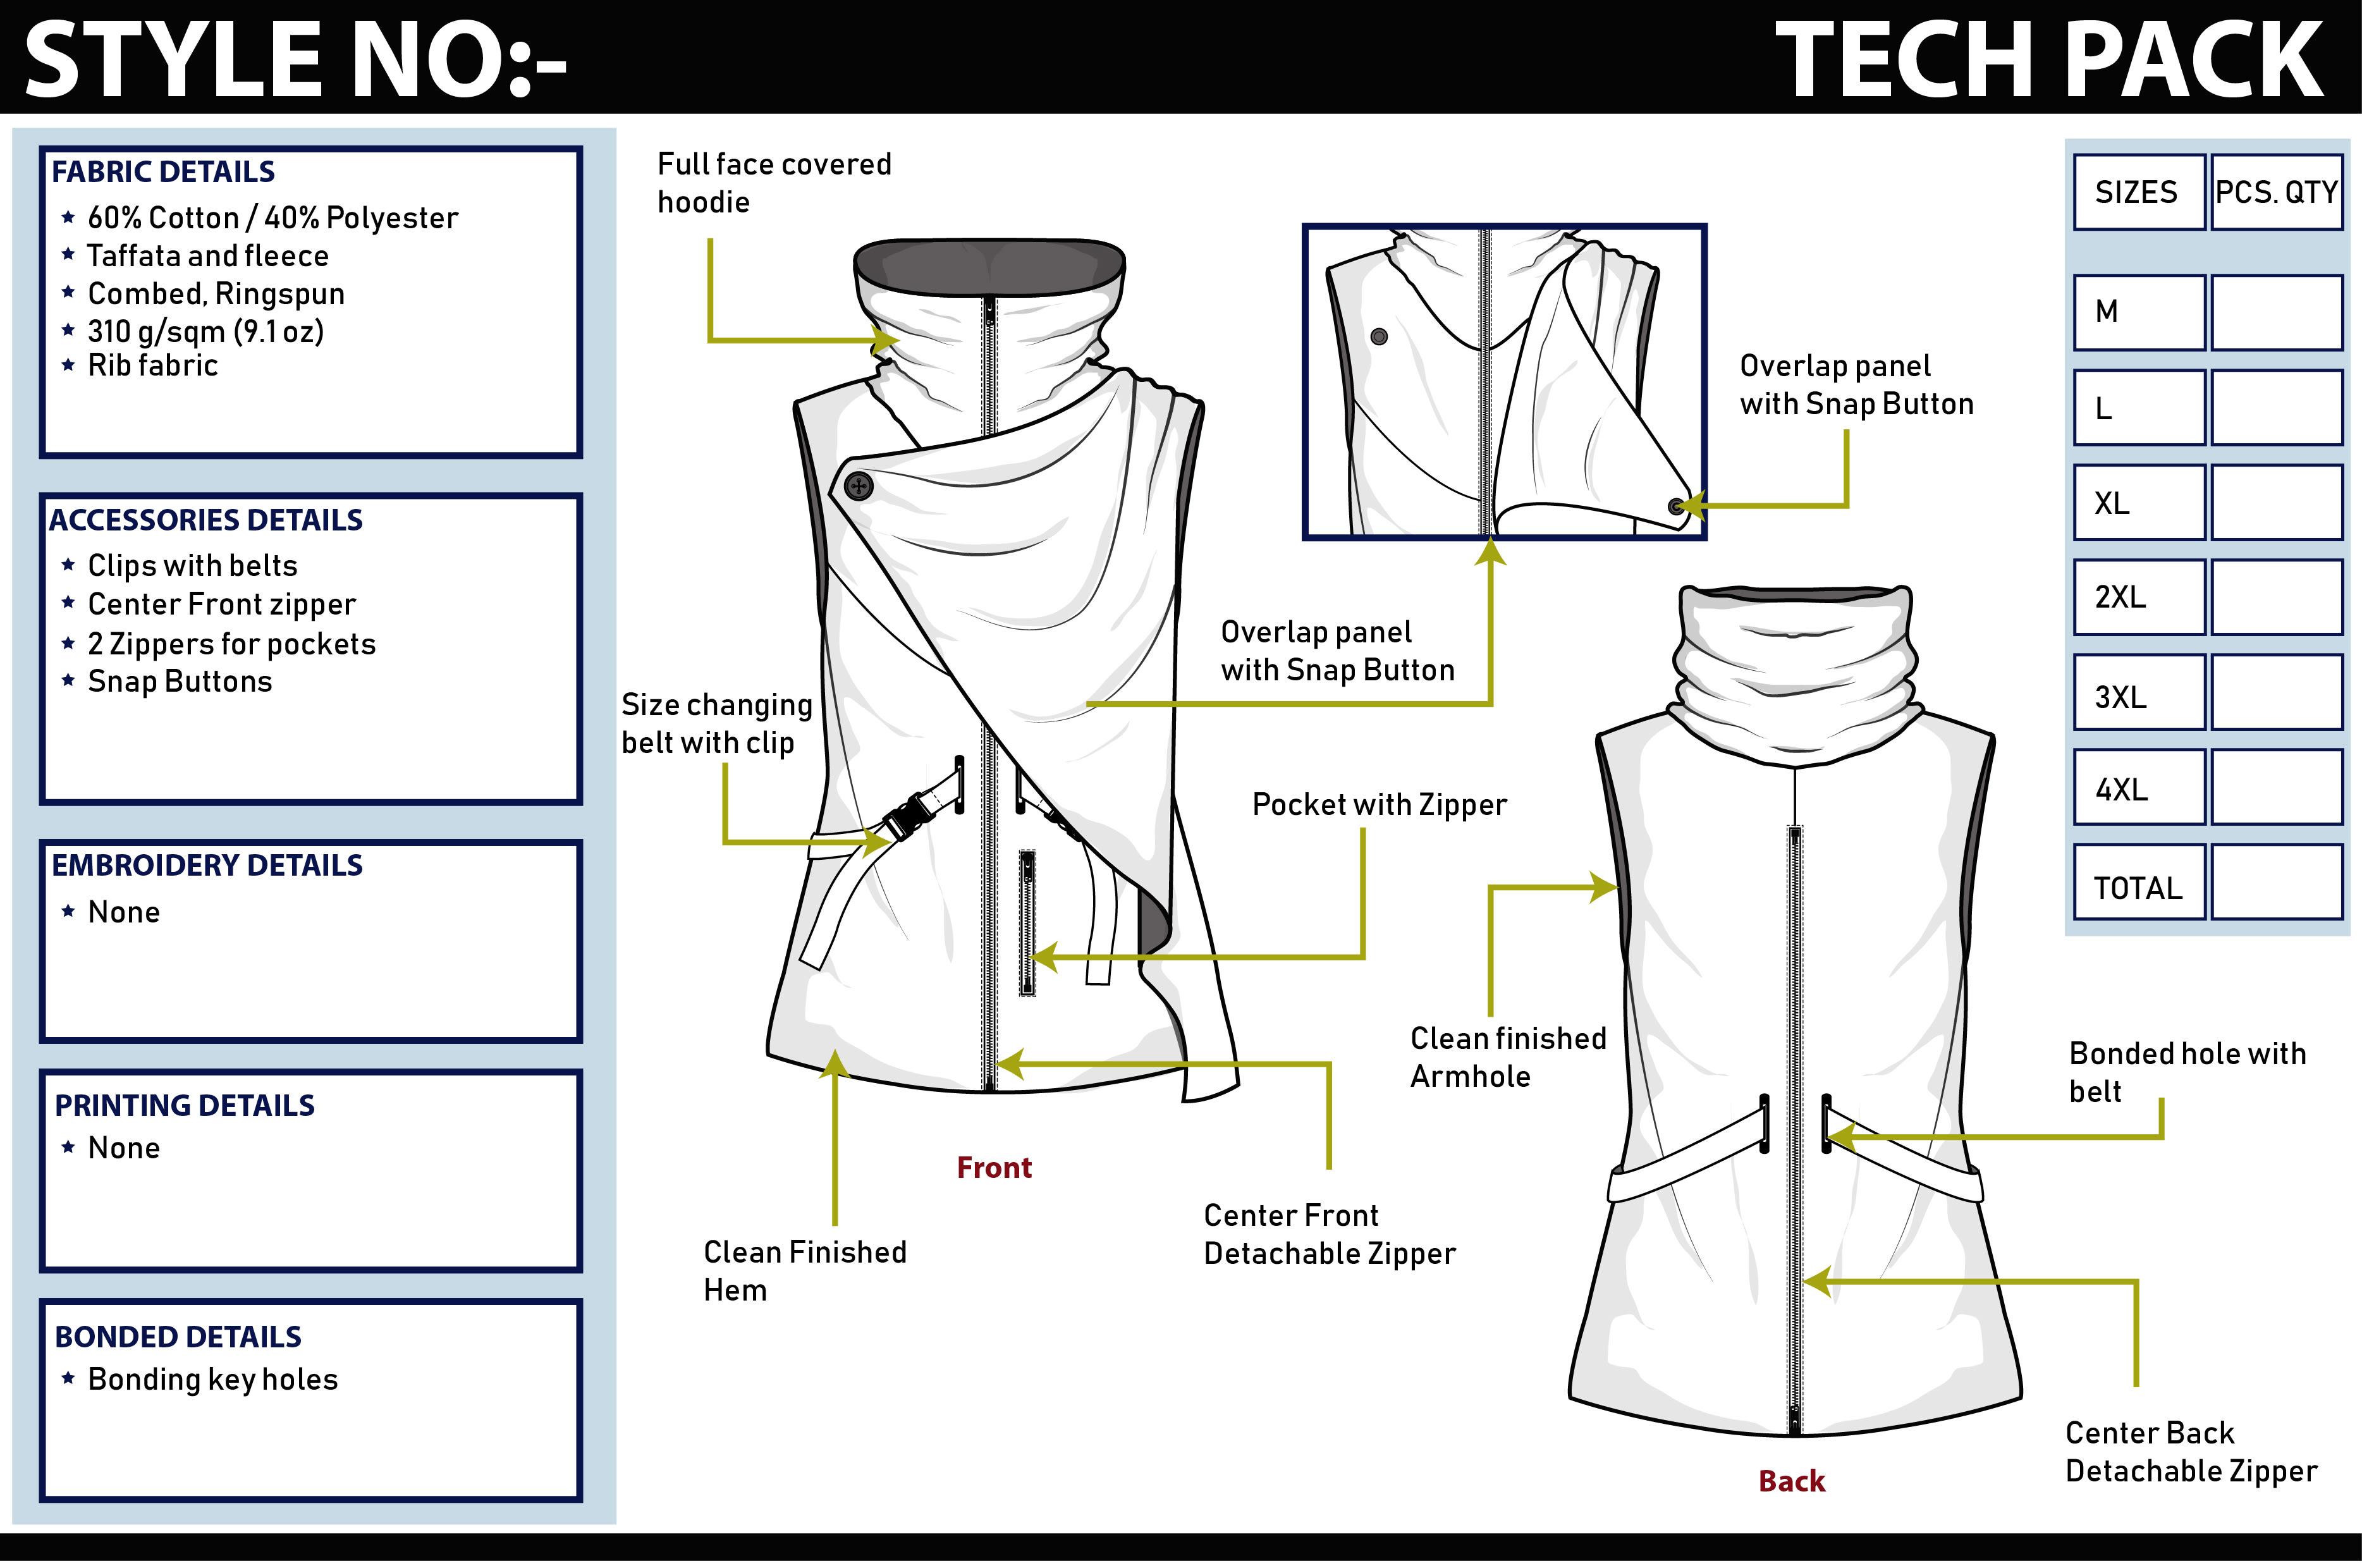 Technical Drawing Tech Packs Sketching And Designing By Ashibandara92